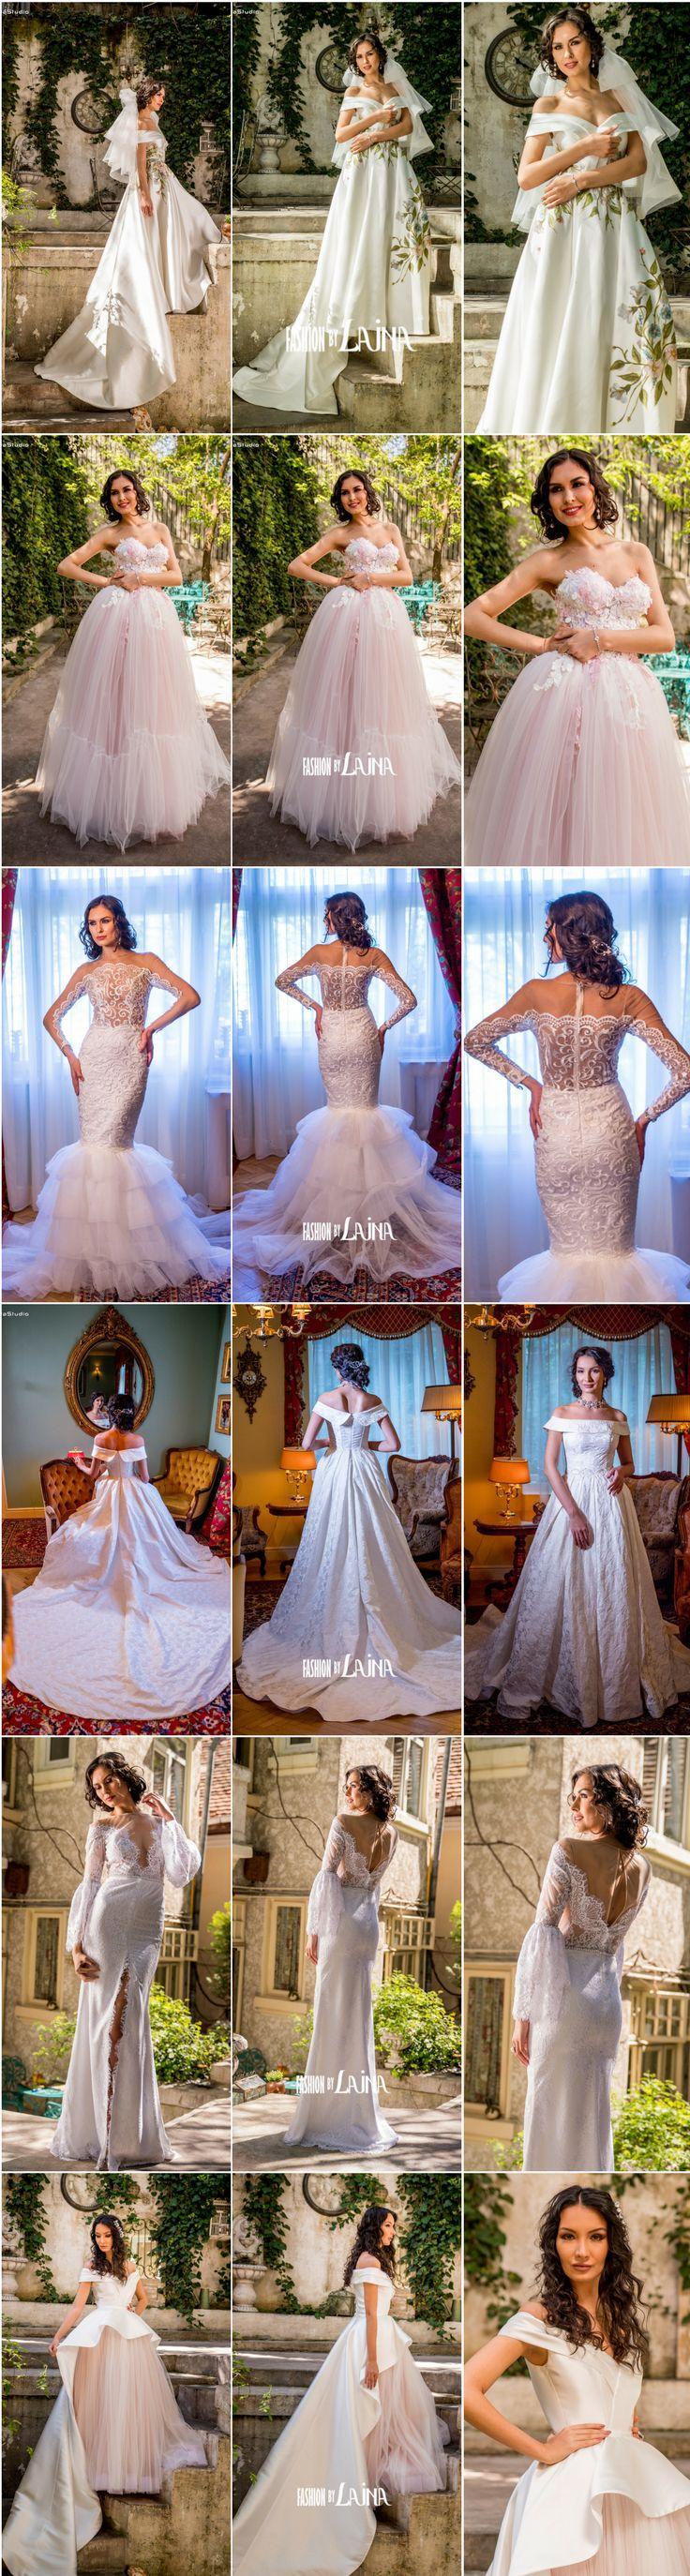 2018 Wedding Dresses by Fashion by Laina #fashionhouse #barcelonabridalweek